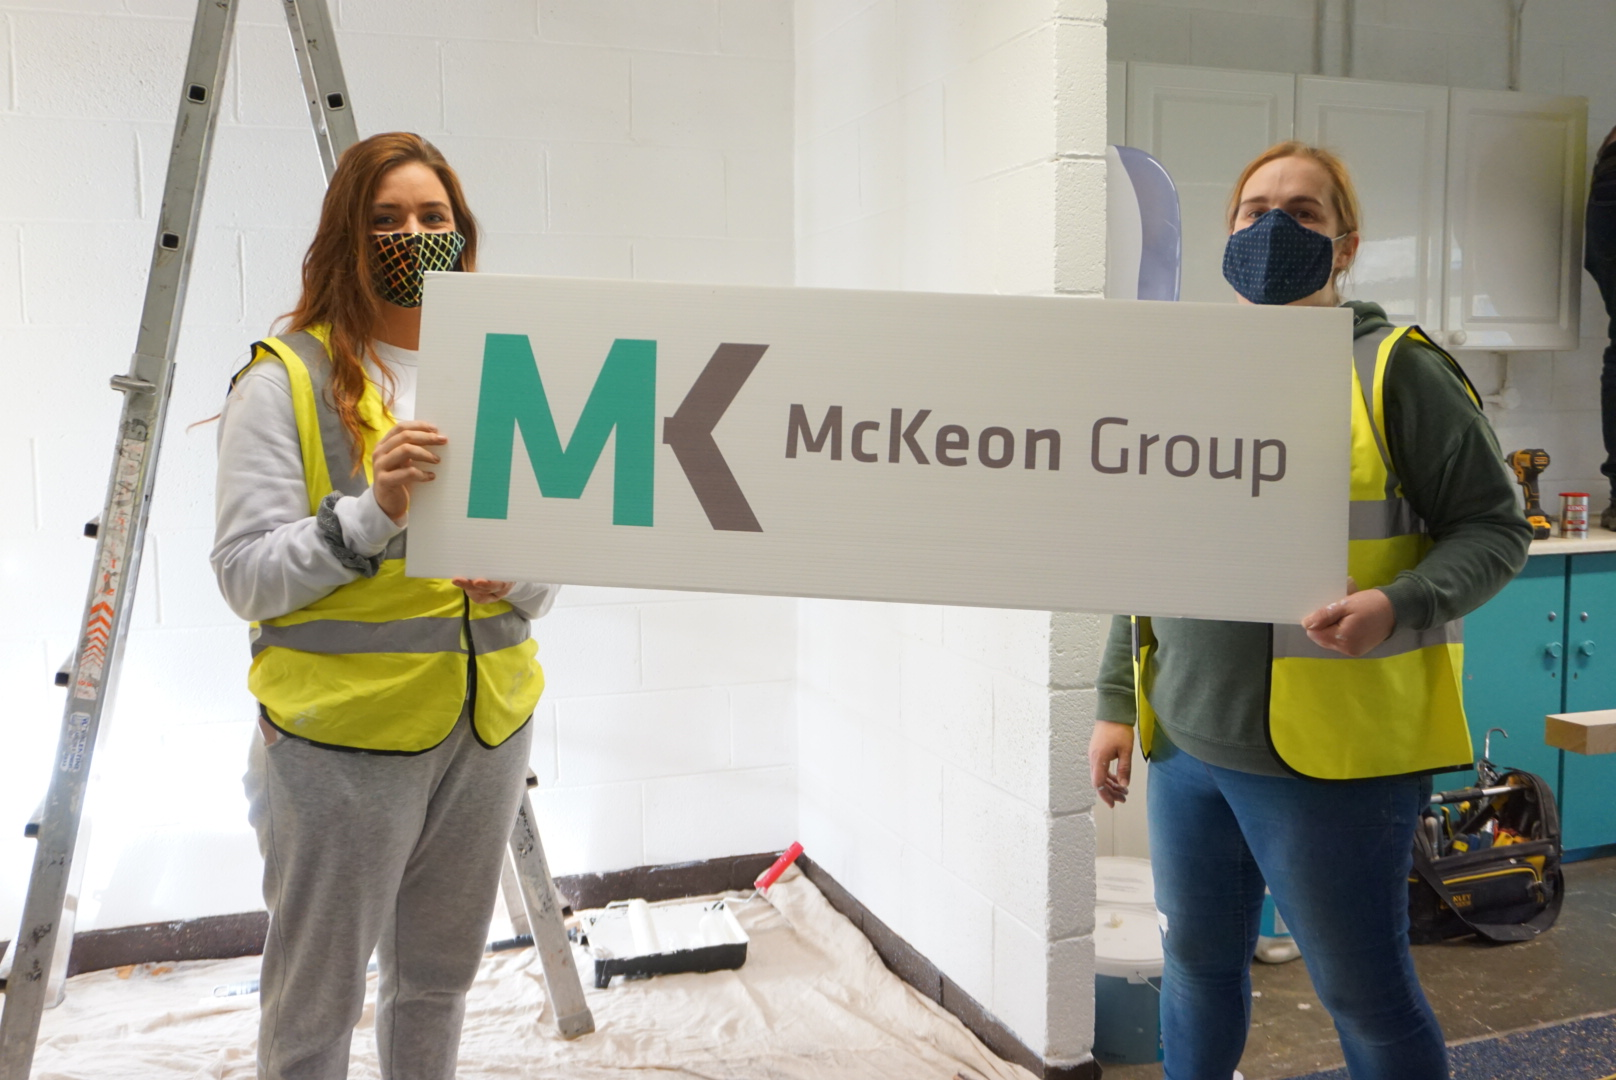 McKeon GroupConstruction & Fit Out